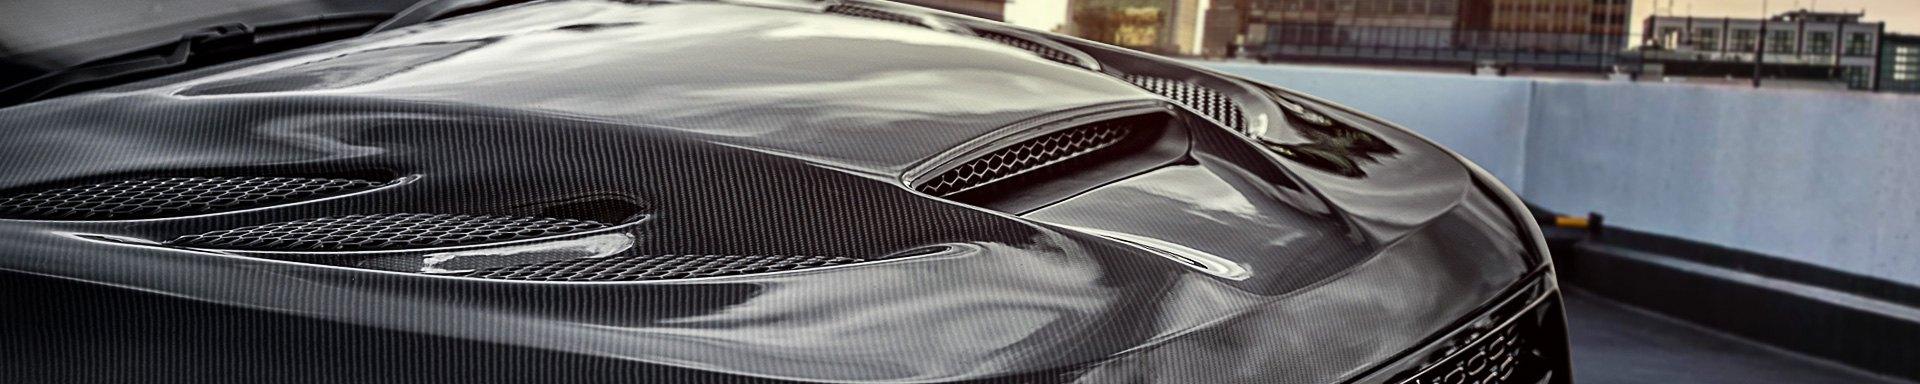 Custom hoods select vehicle